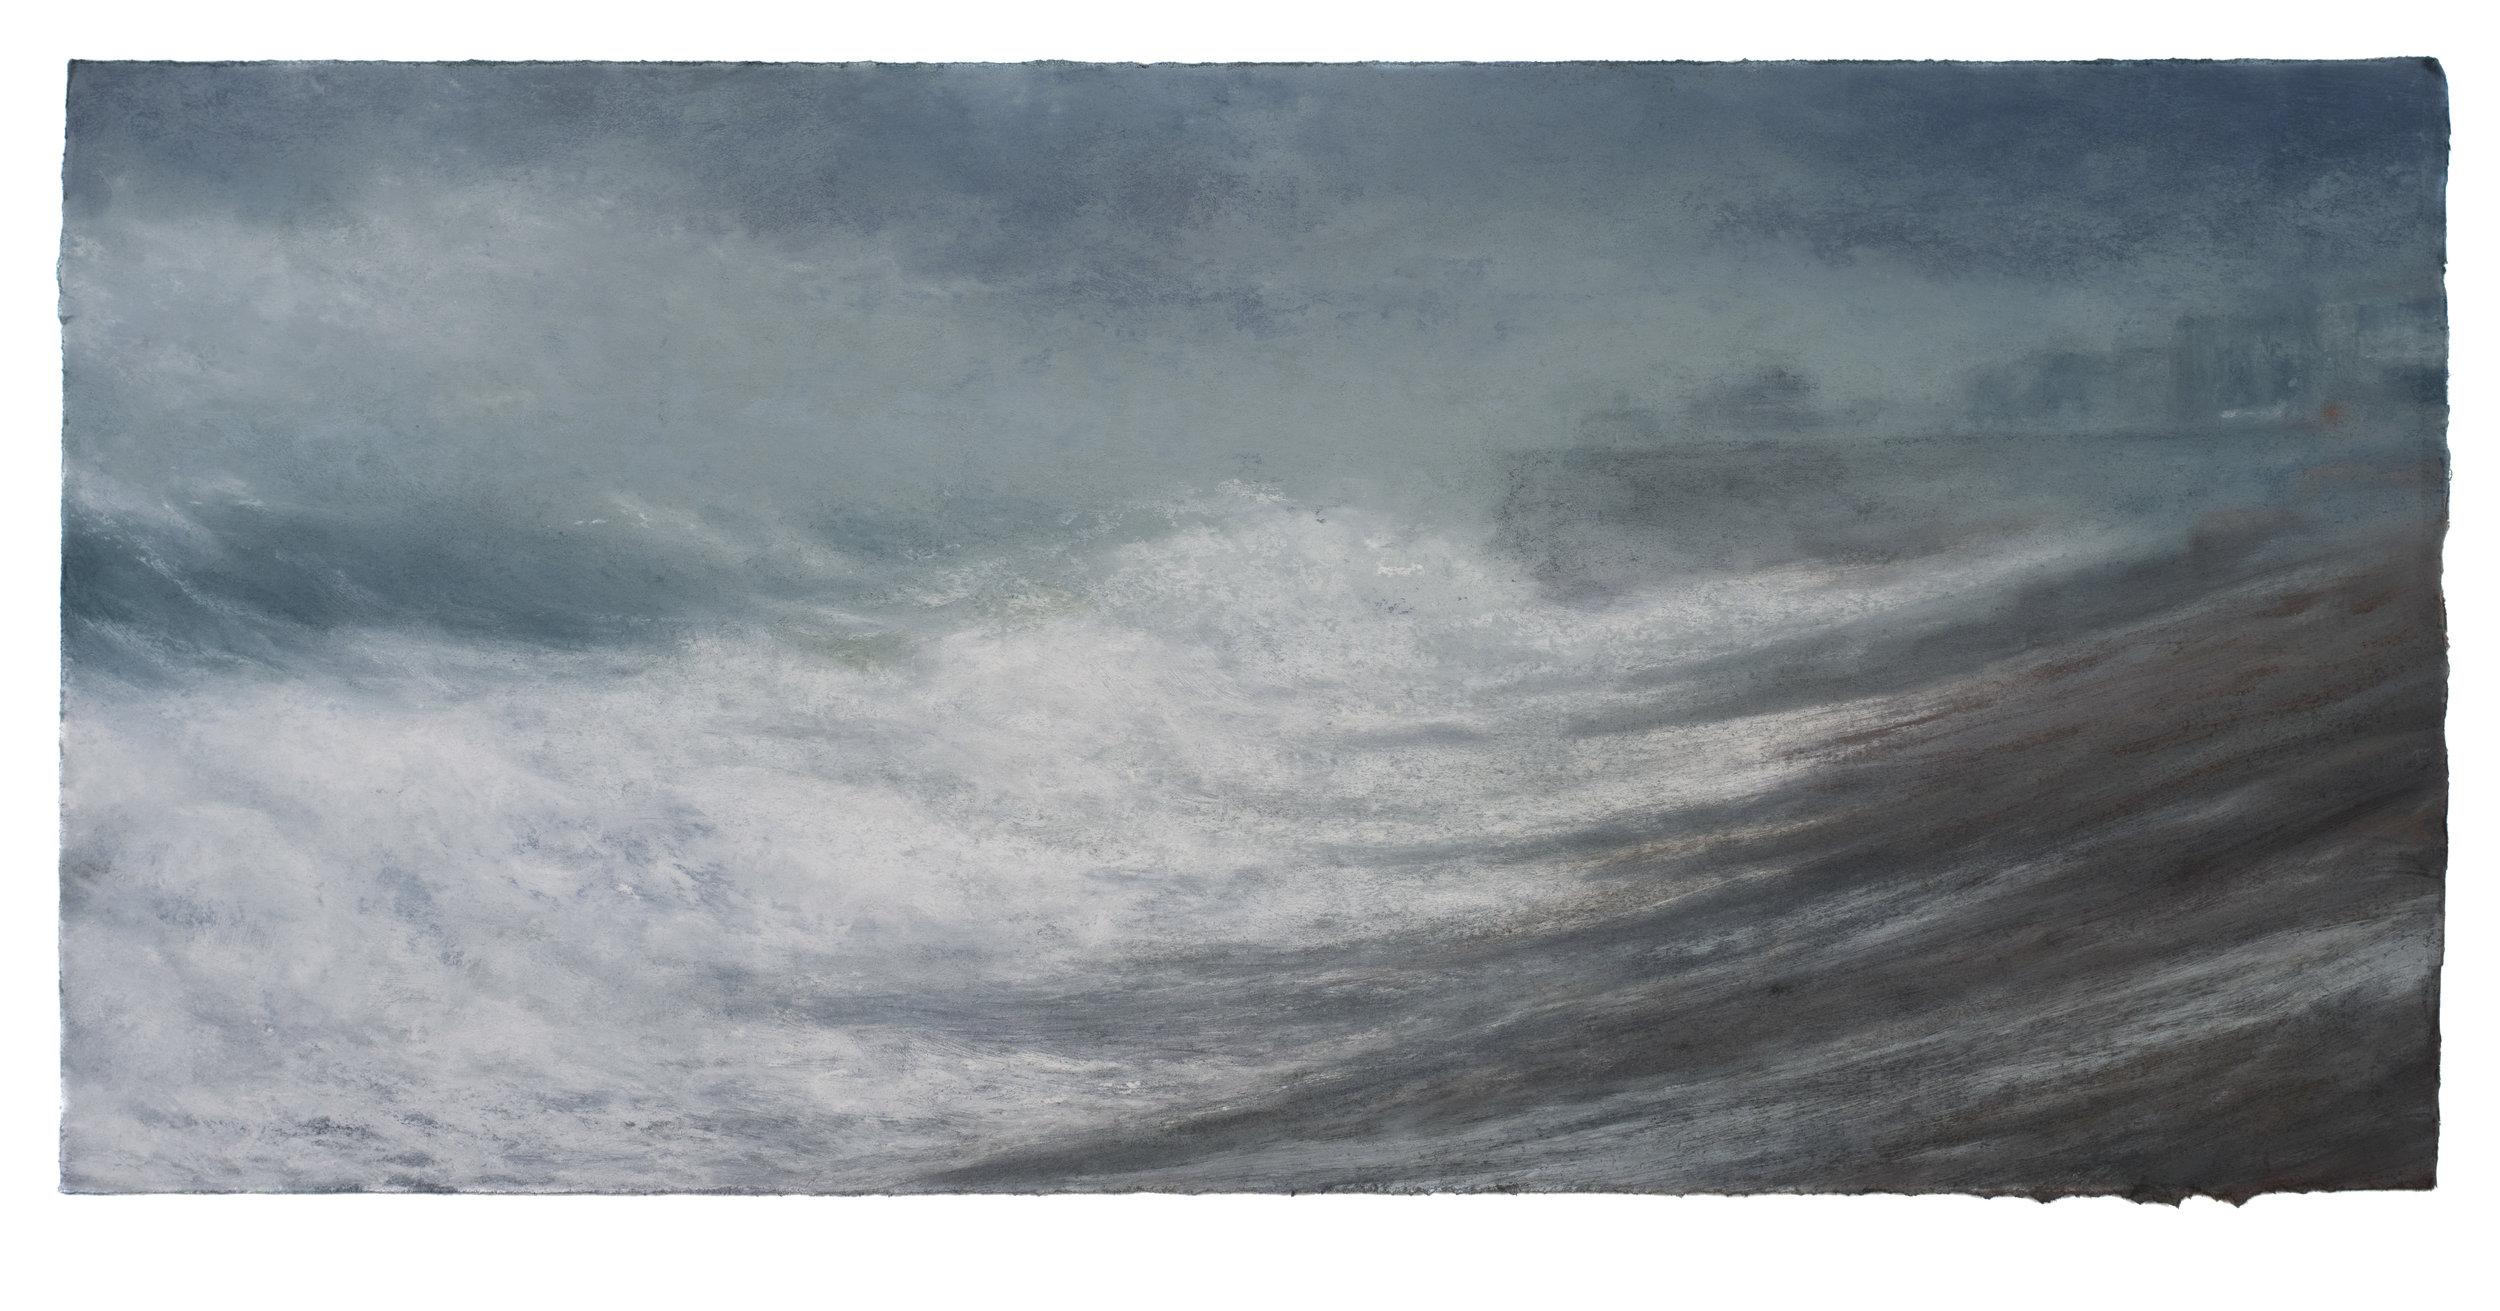 Artist: Matthew Draper  Title: Impending Storm  Size: 56 x 69.5 cm  Medium: Pastel on paper  Price: £3250